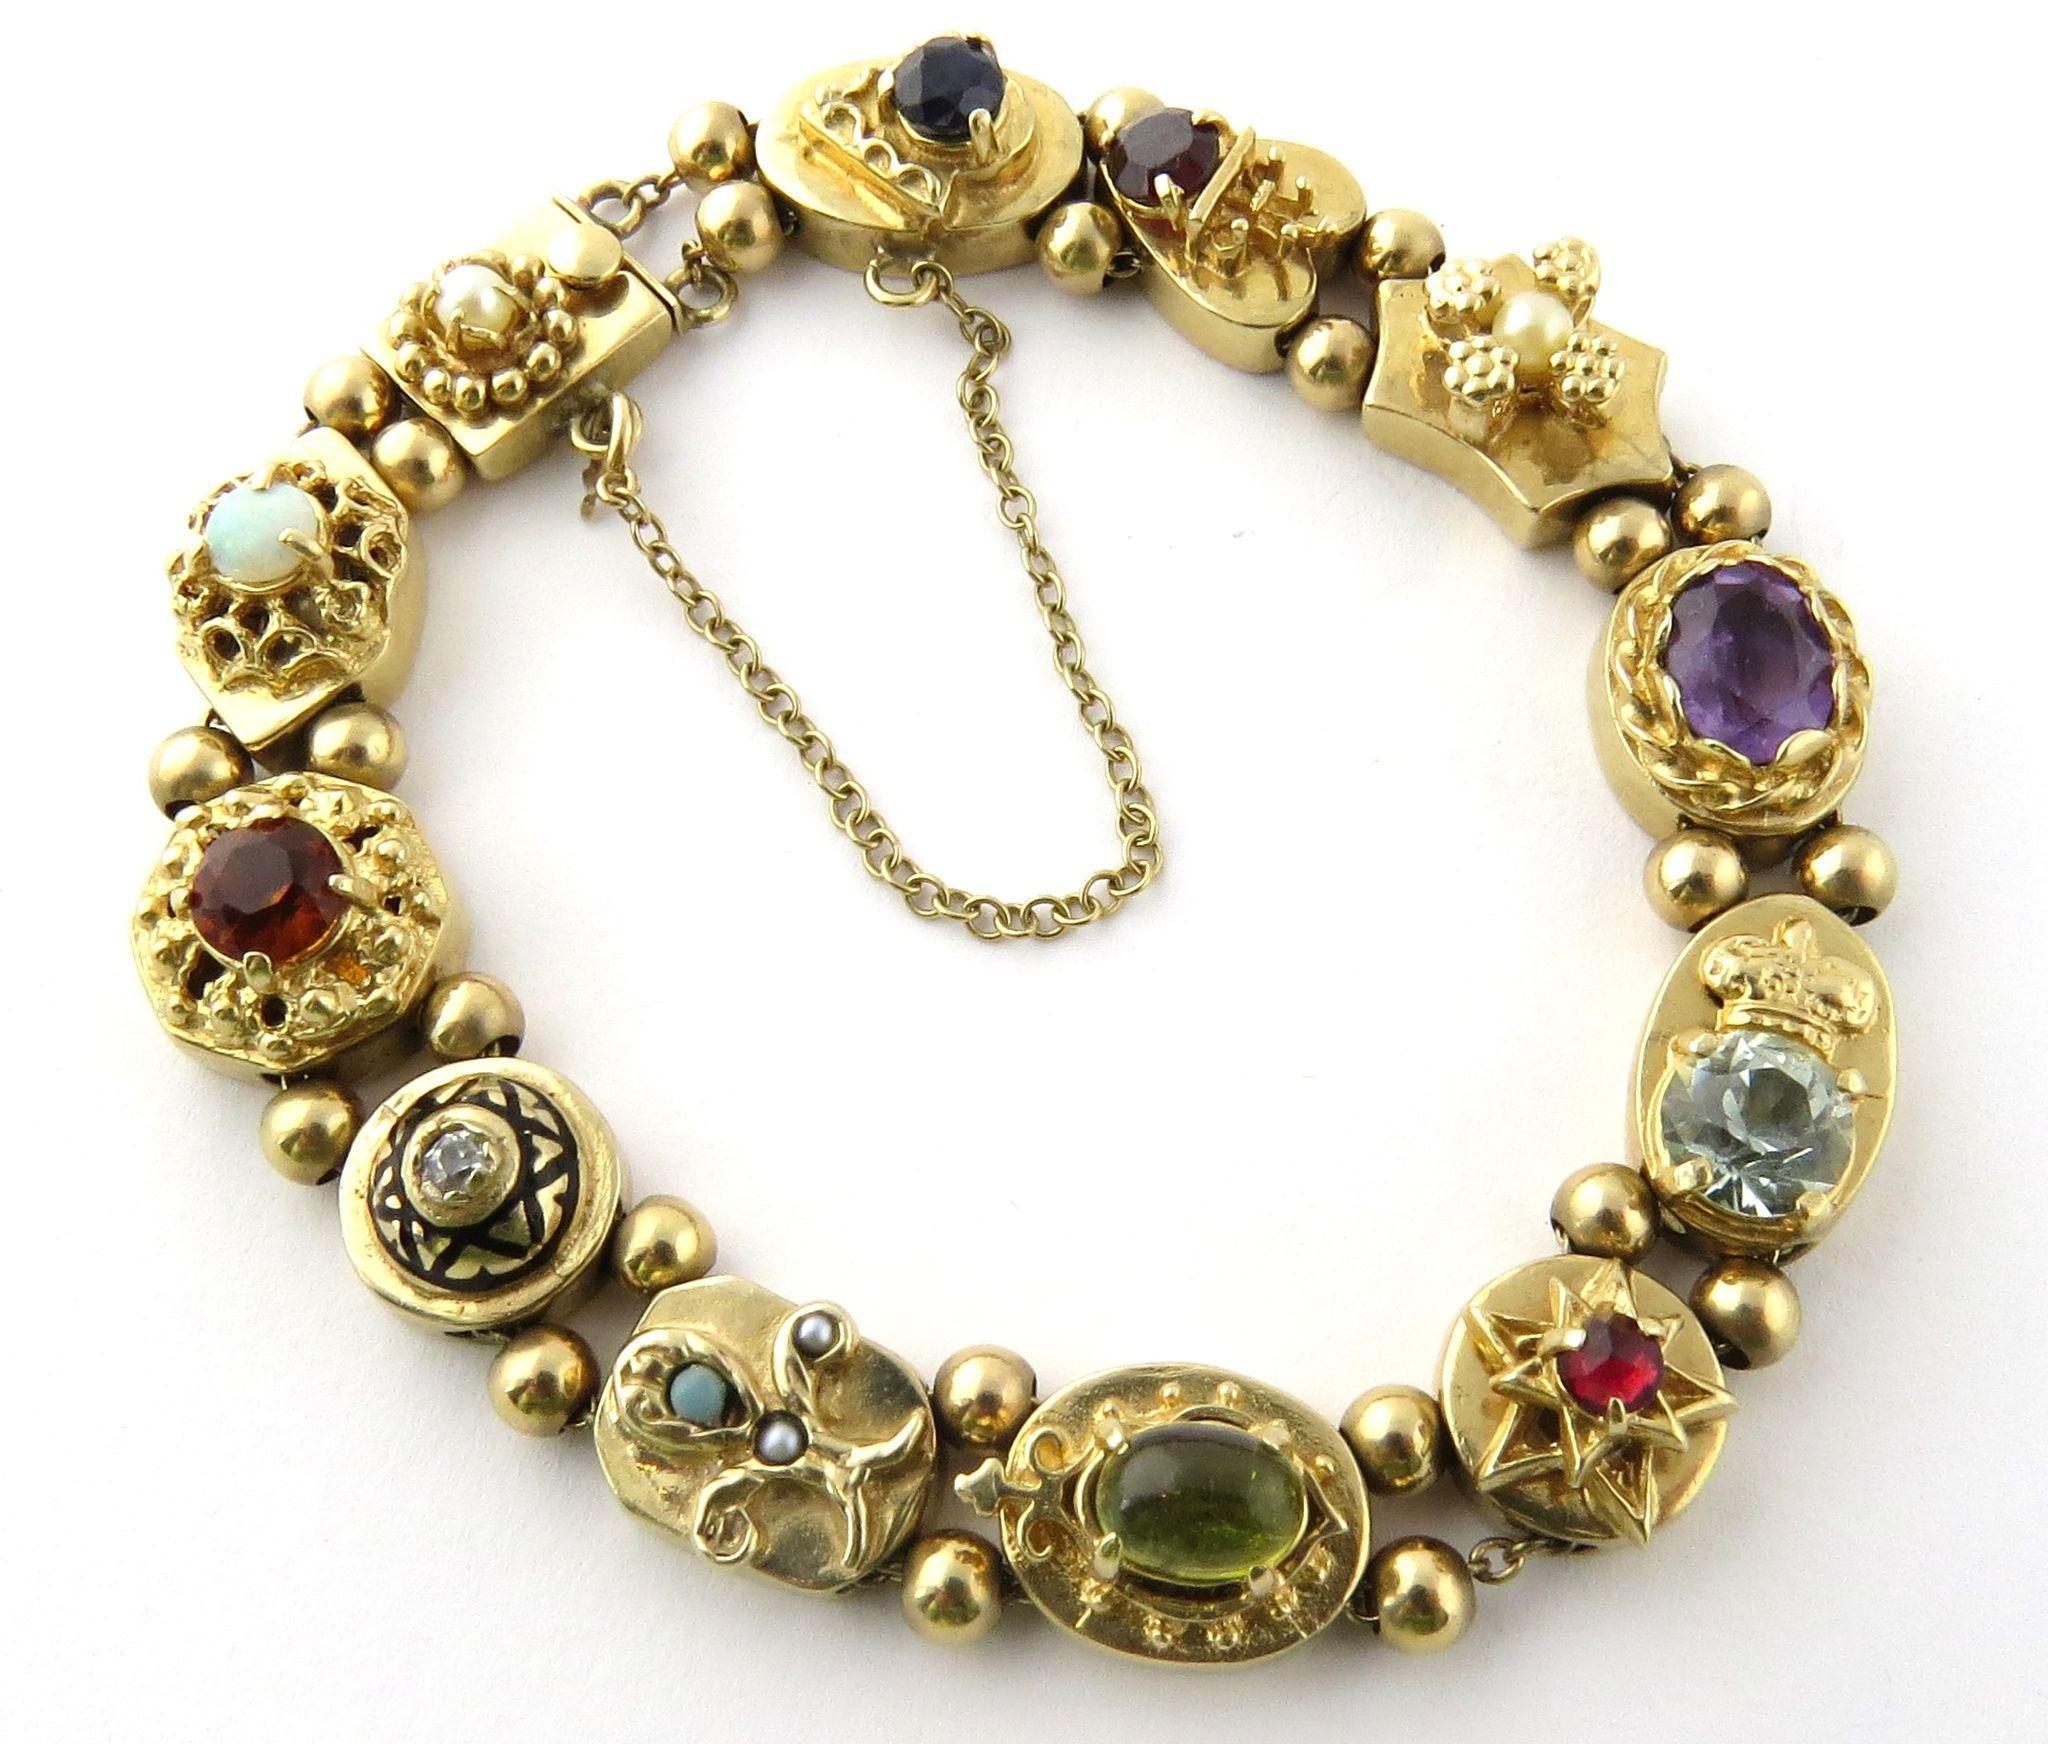 Vintage 14K Yellow Gold Slide Charm Bracelet With Multiple